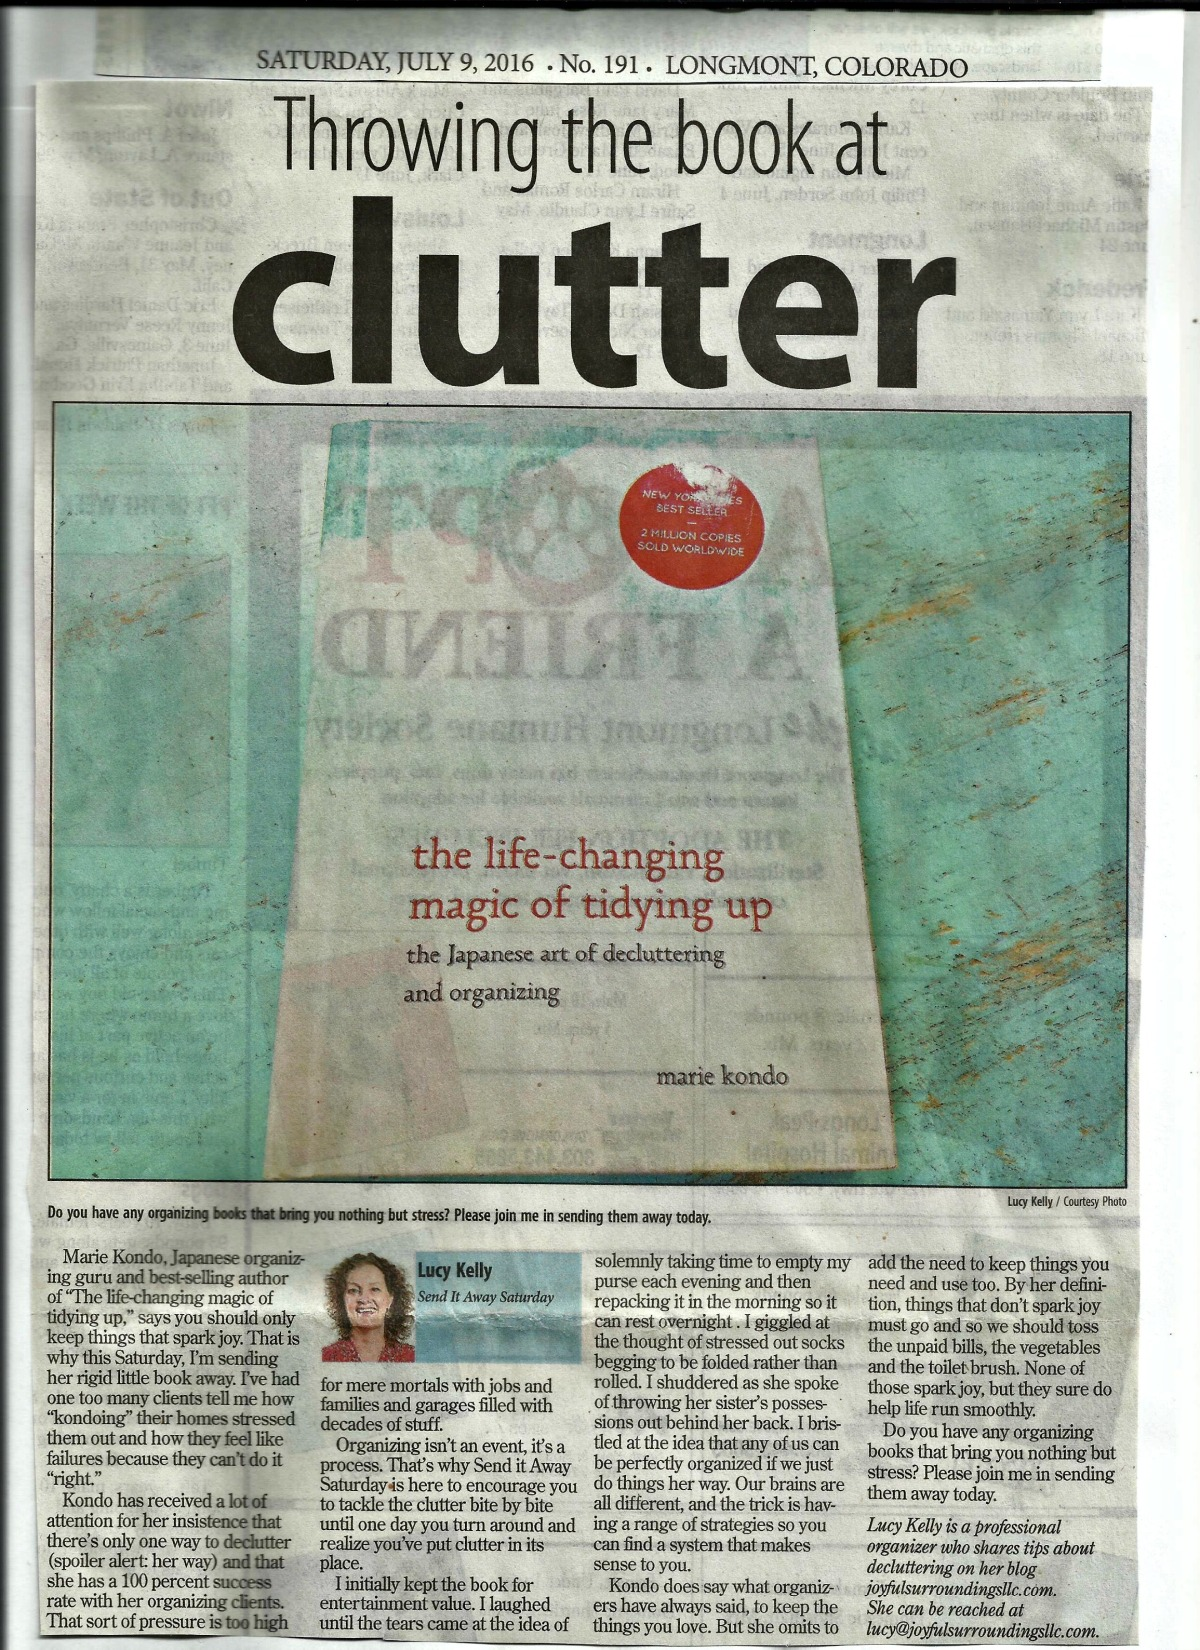 Longmont Times-Call Send it away Saturday column July 2016